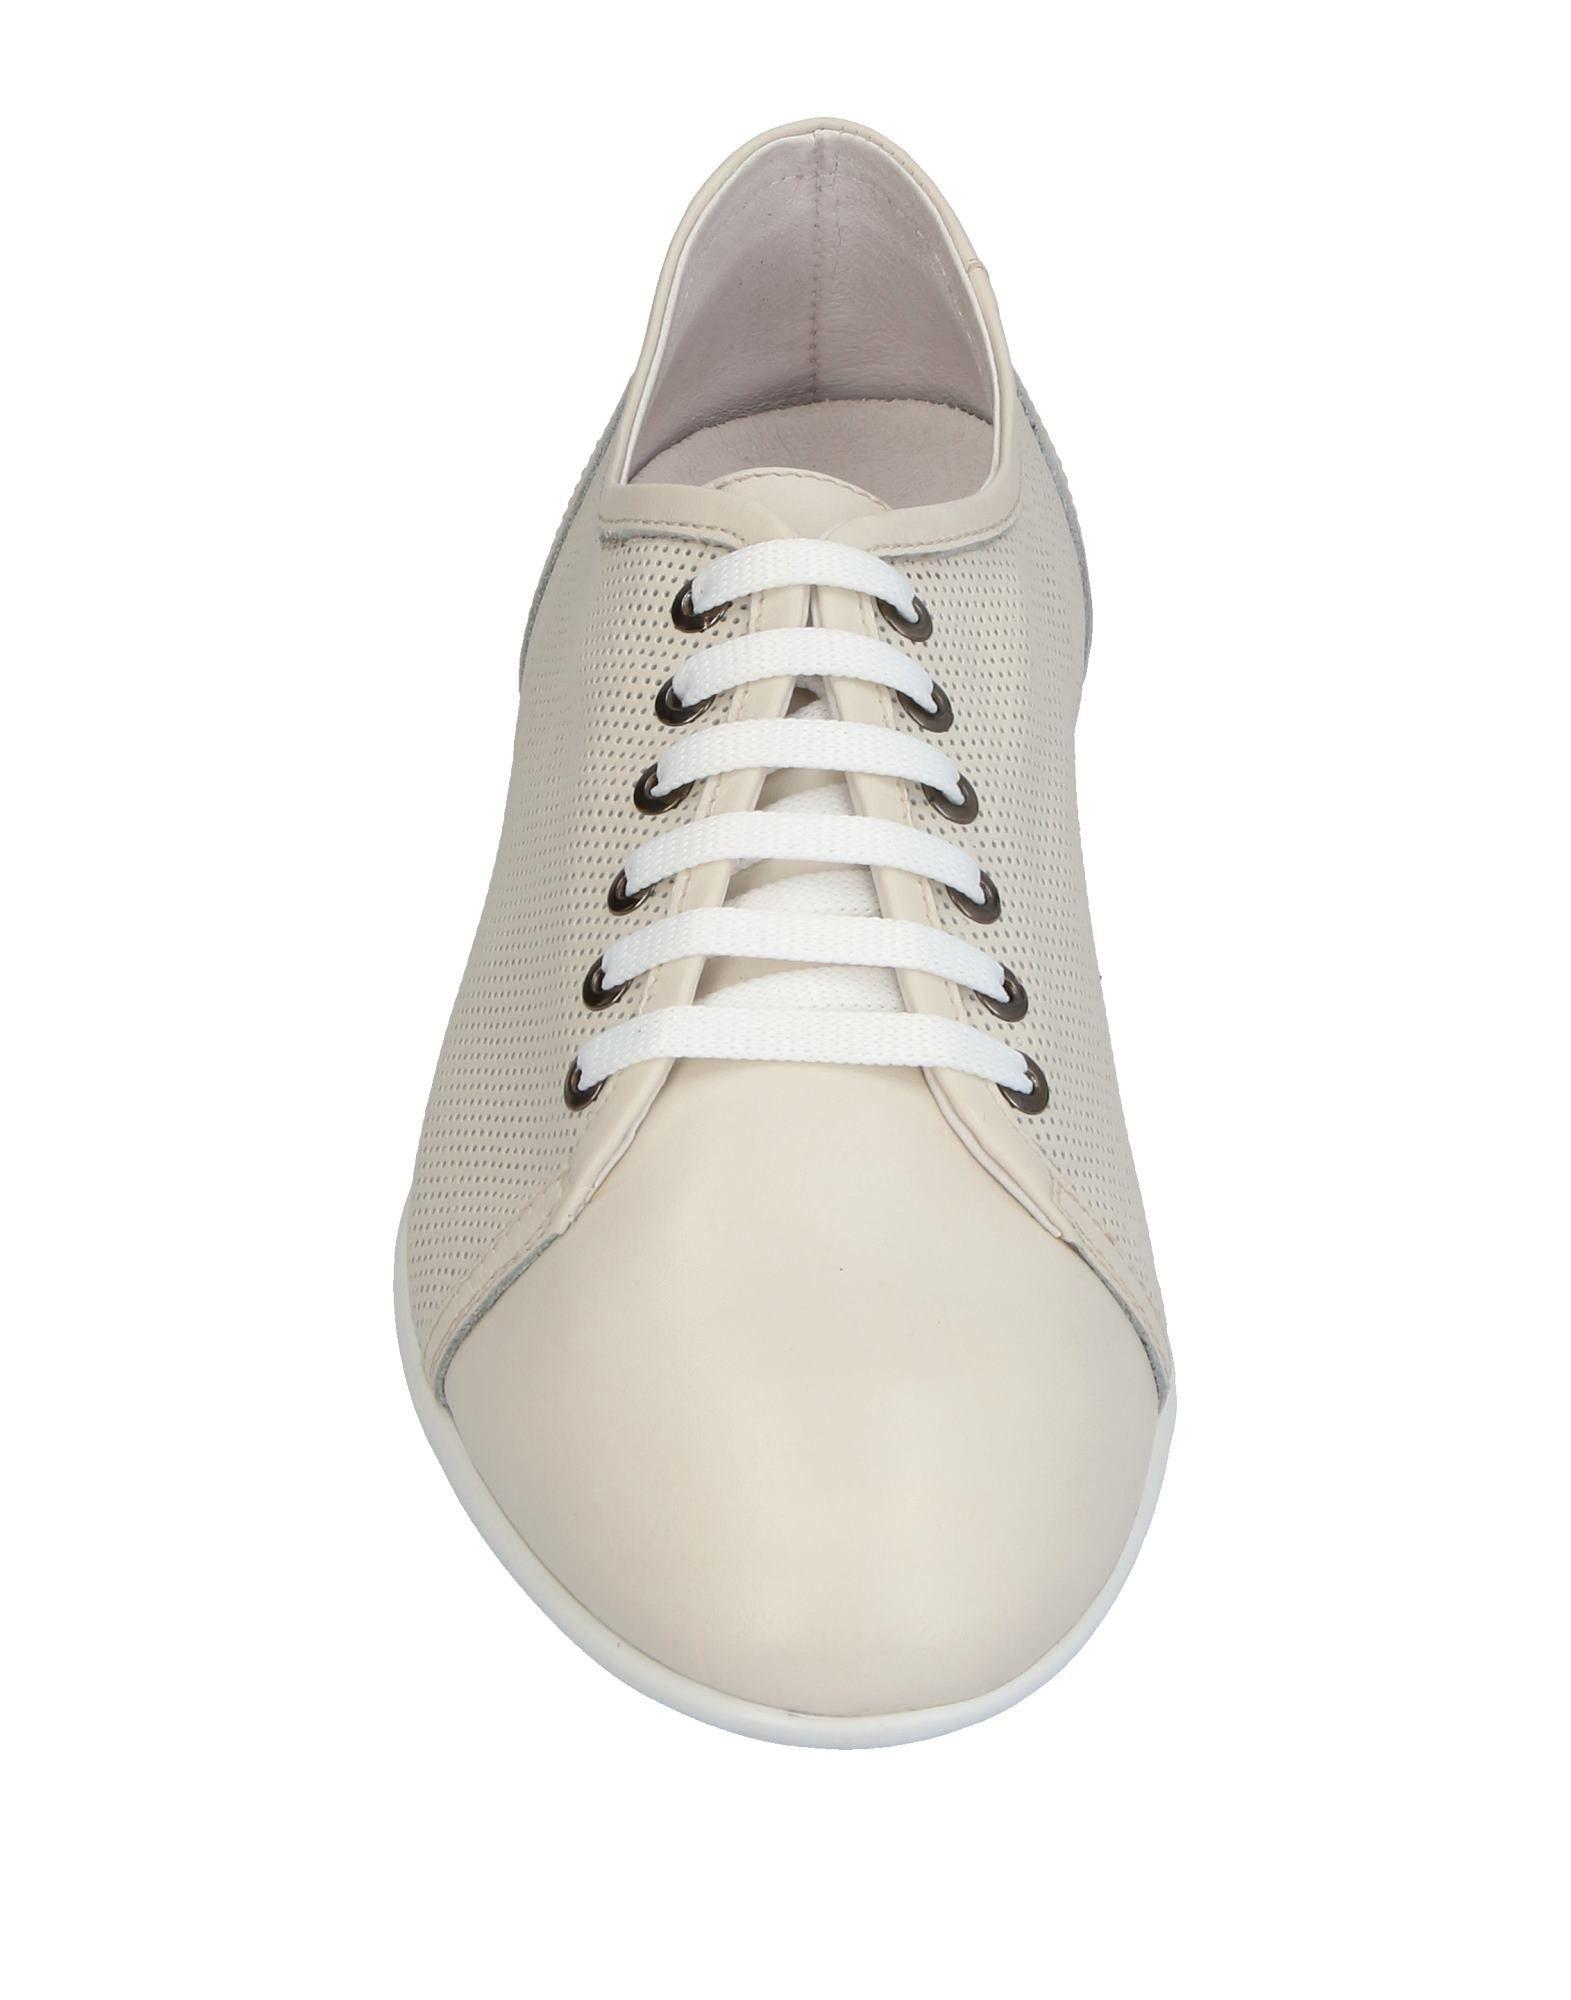 Gianfranco Lattanzi Sneakers Herren  11385363FV Gute Qualität beliebte Schuhe